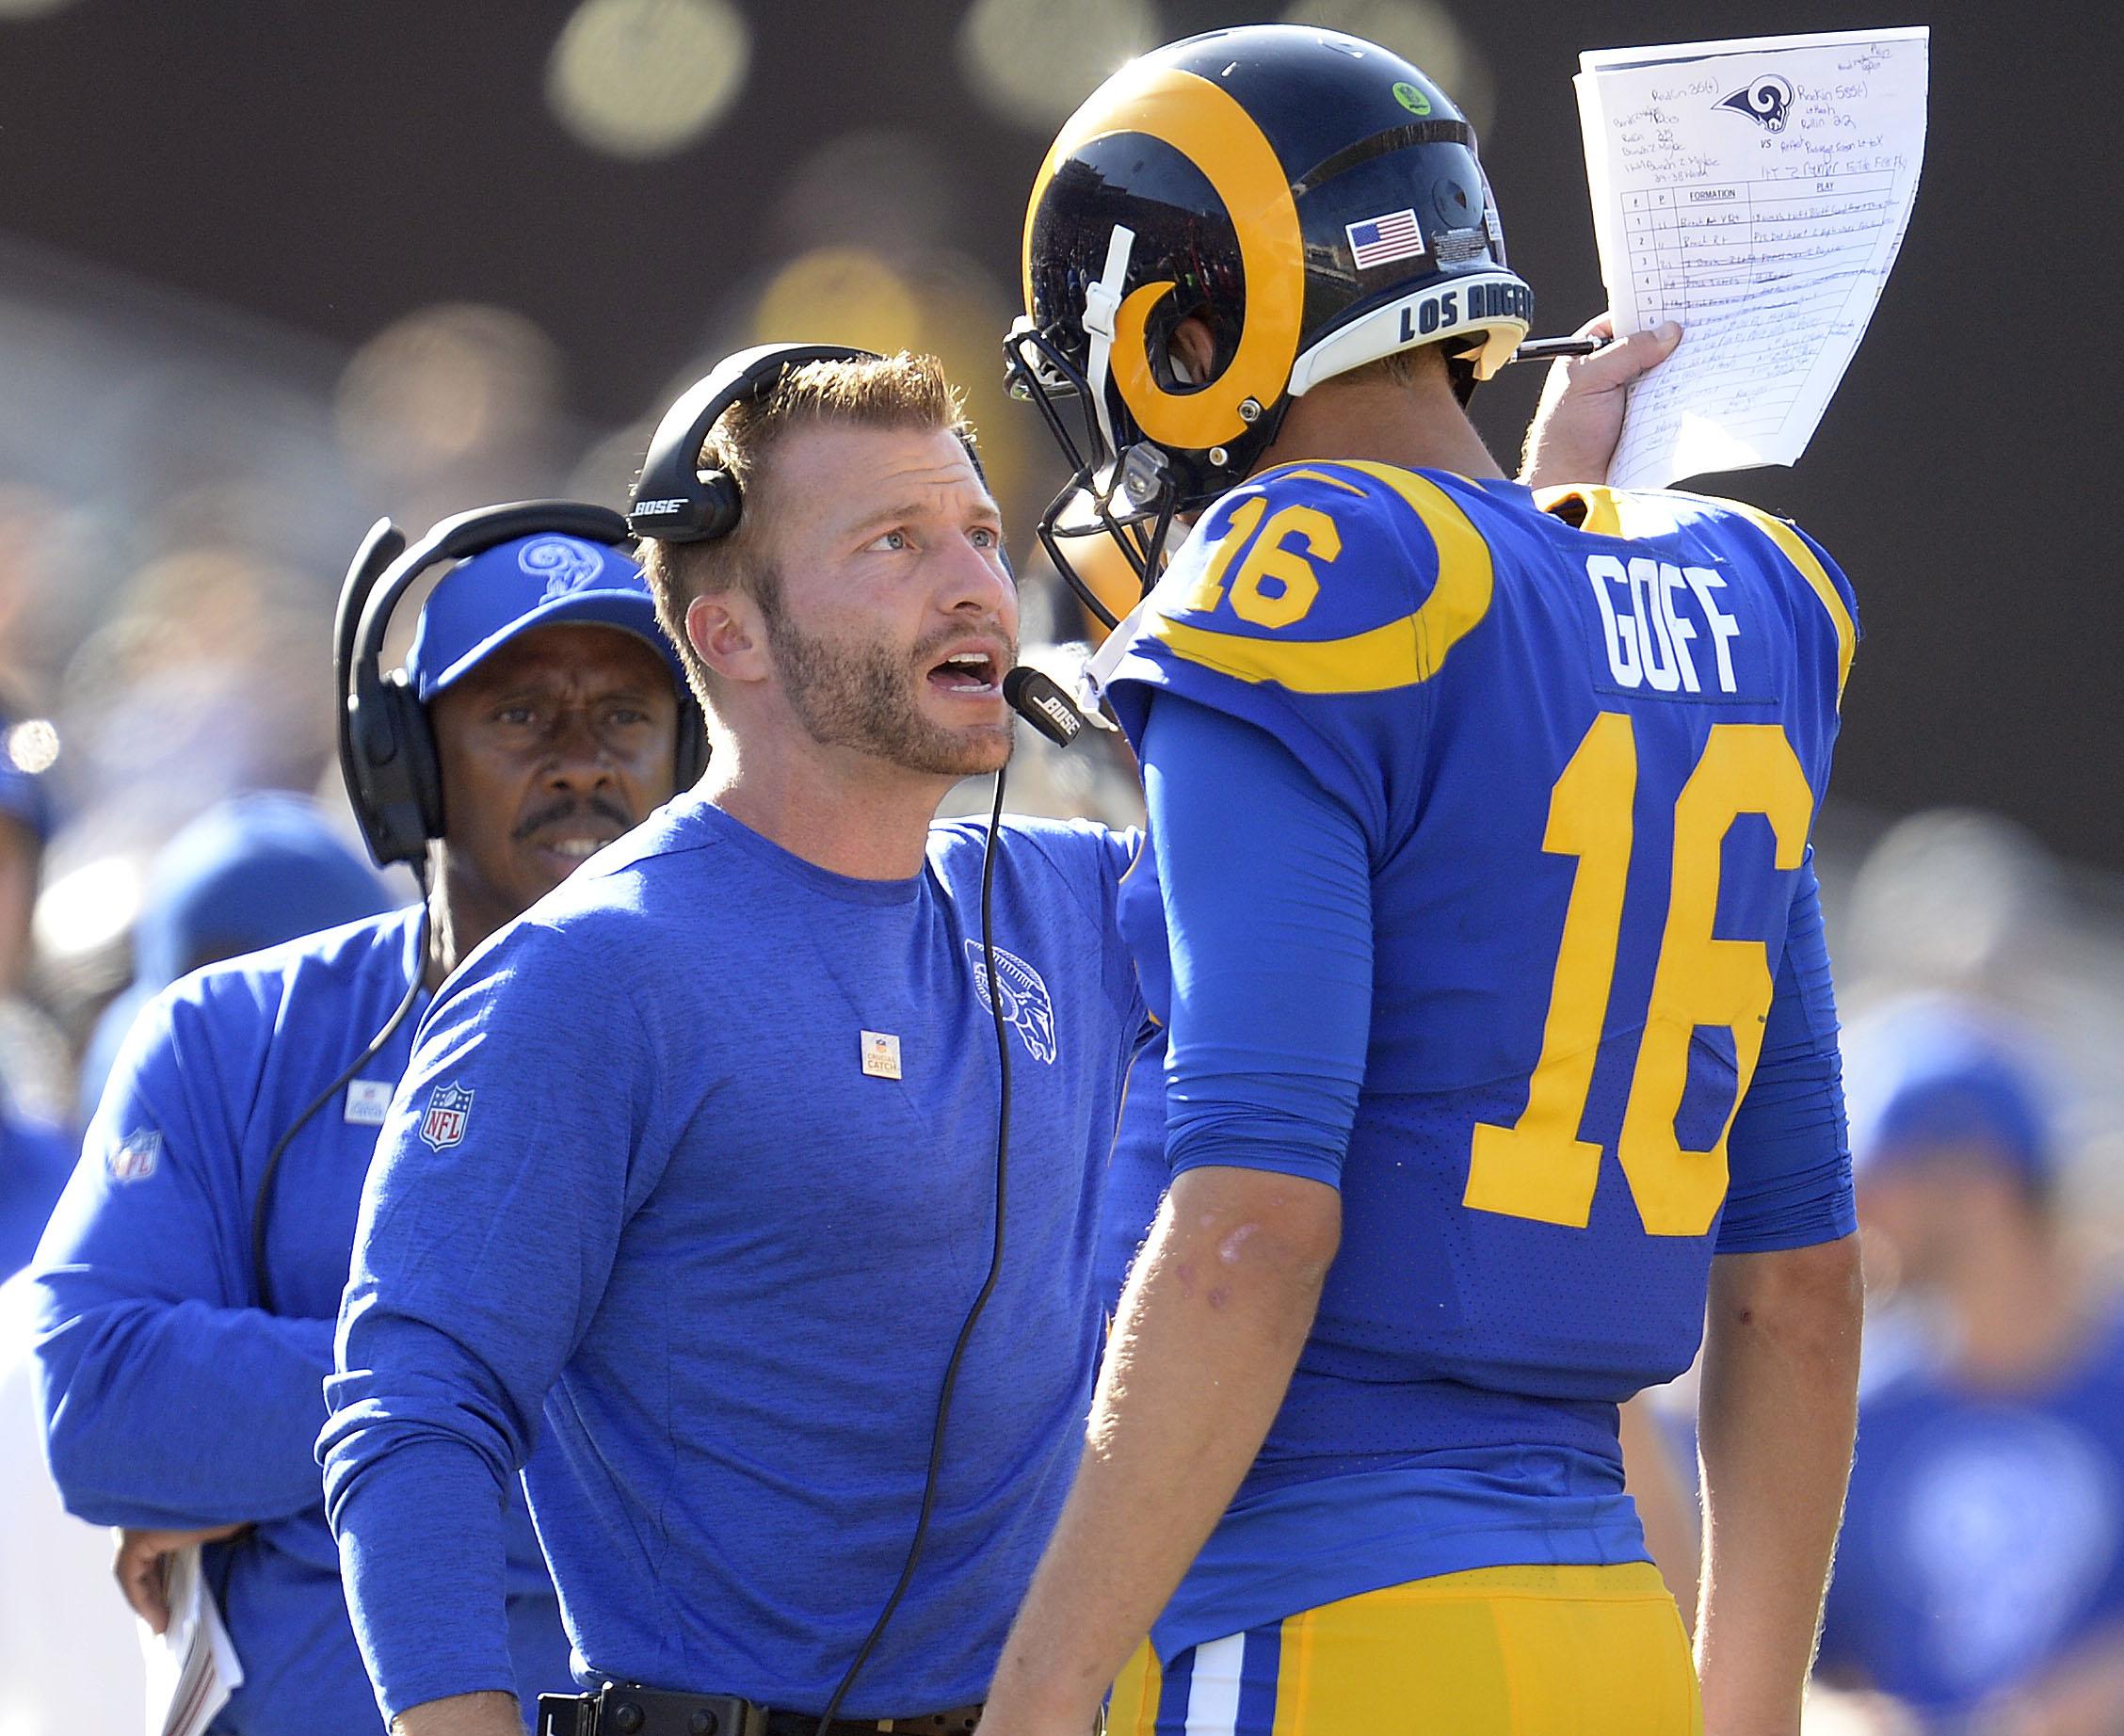 Los Angeles Rams HC Sean McVay & QB Jared Goff